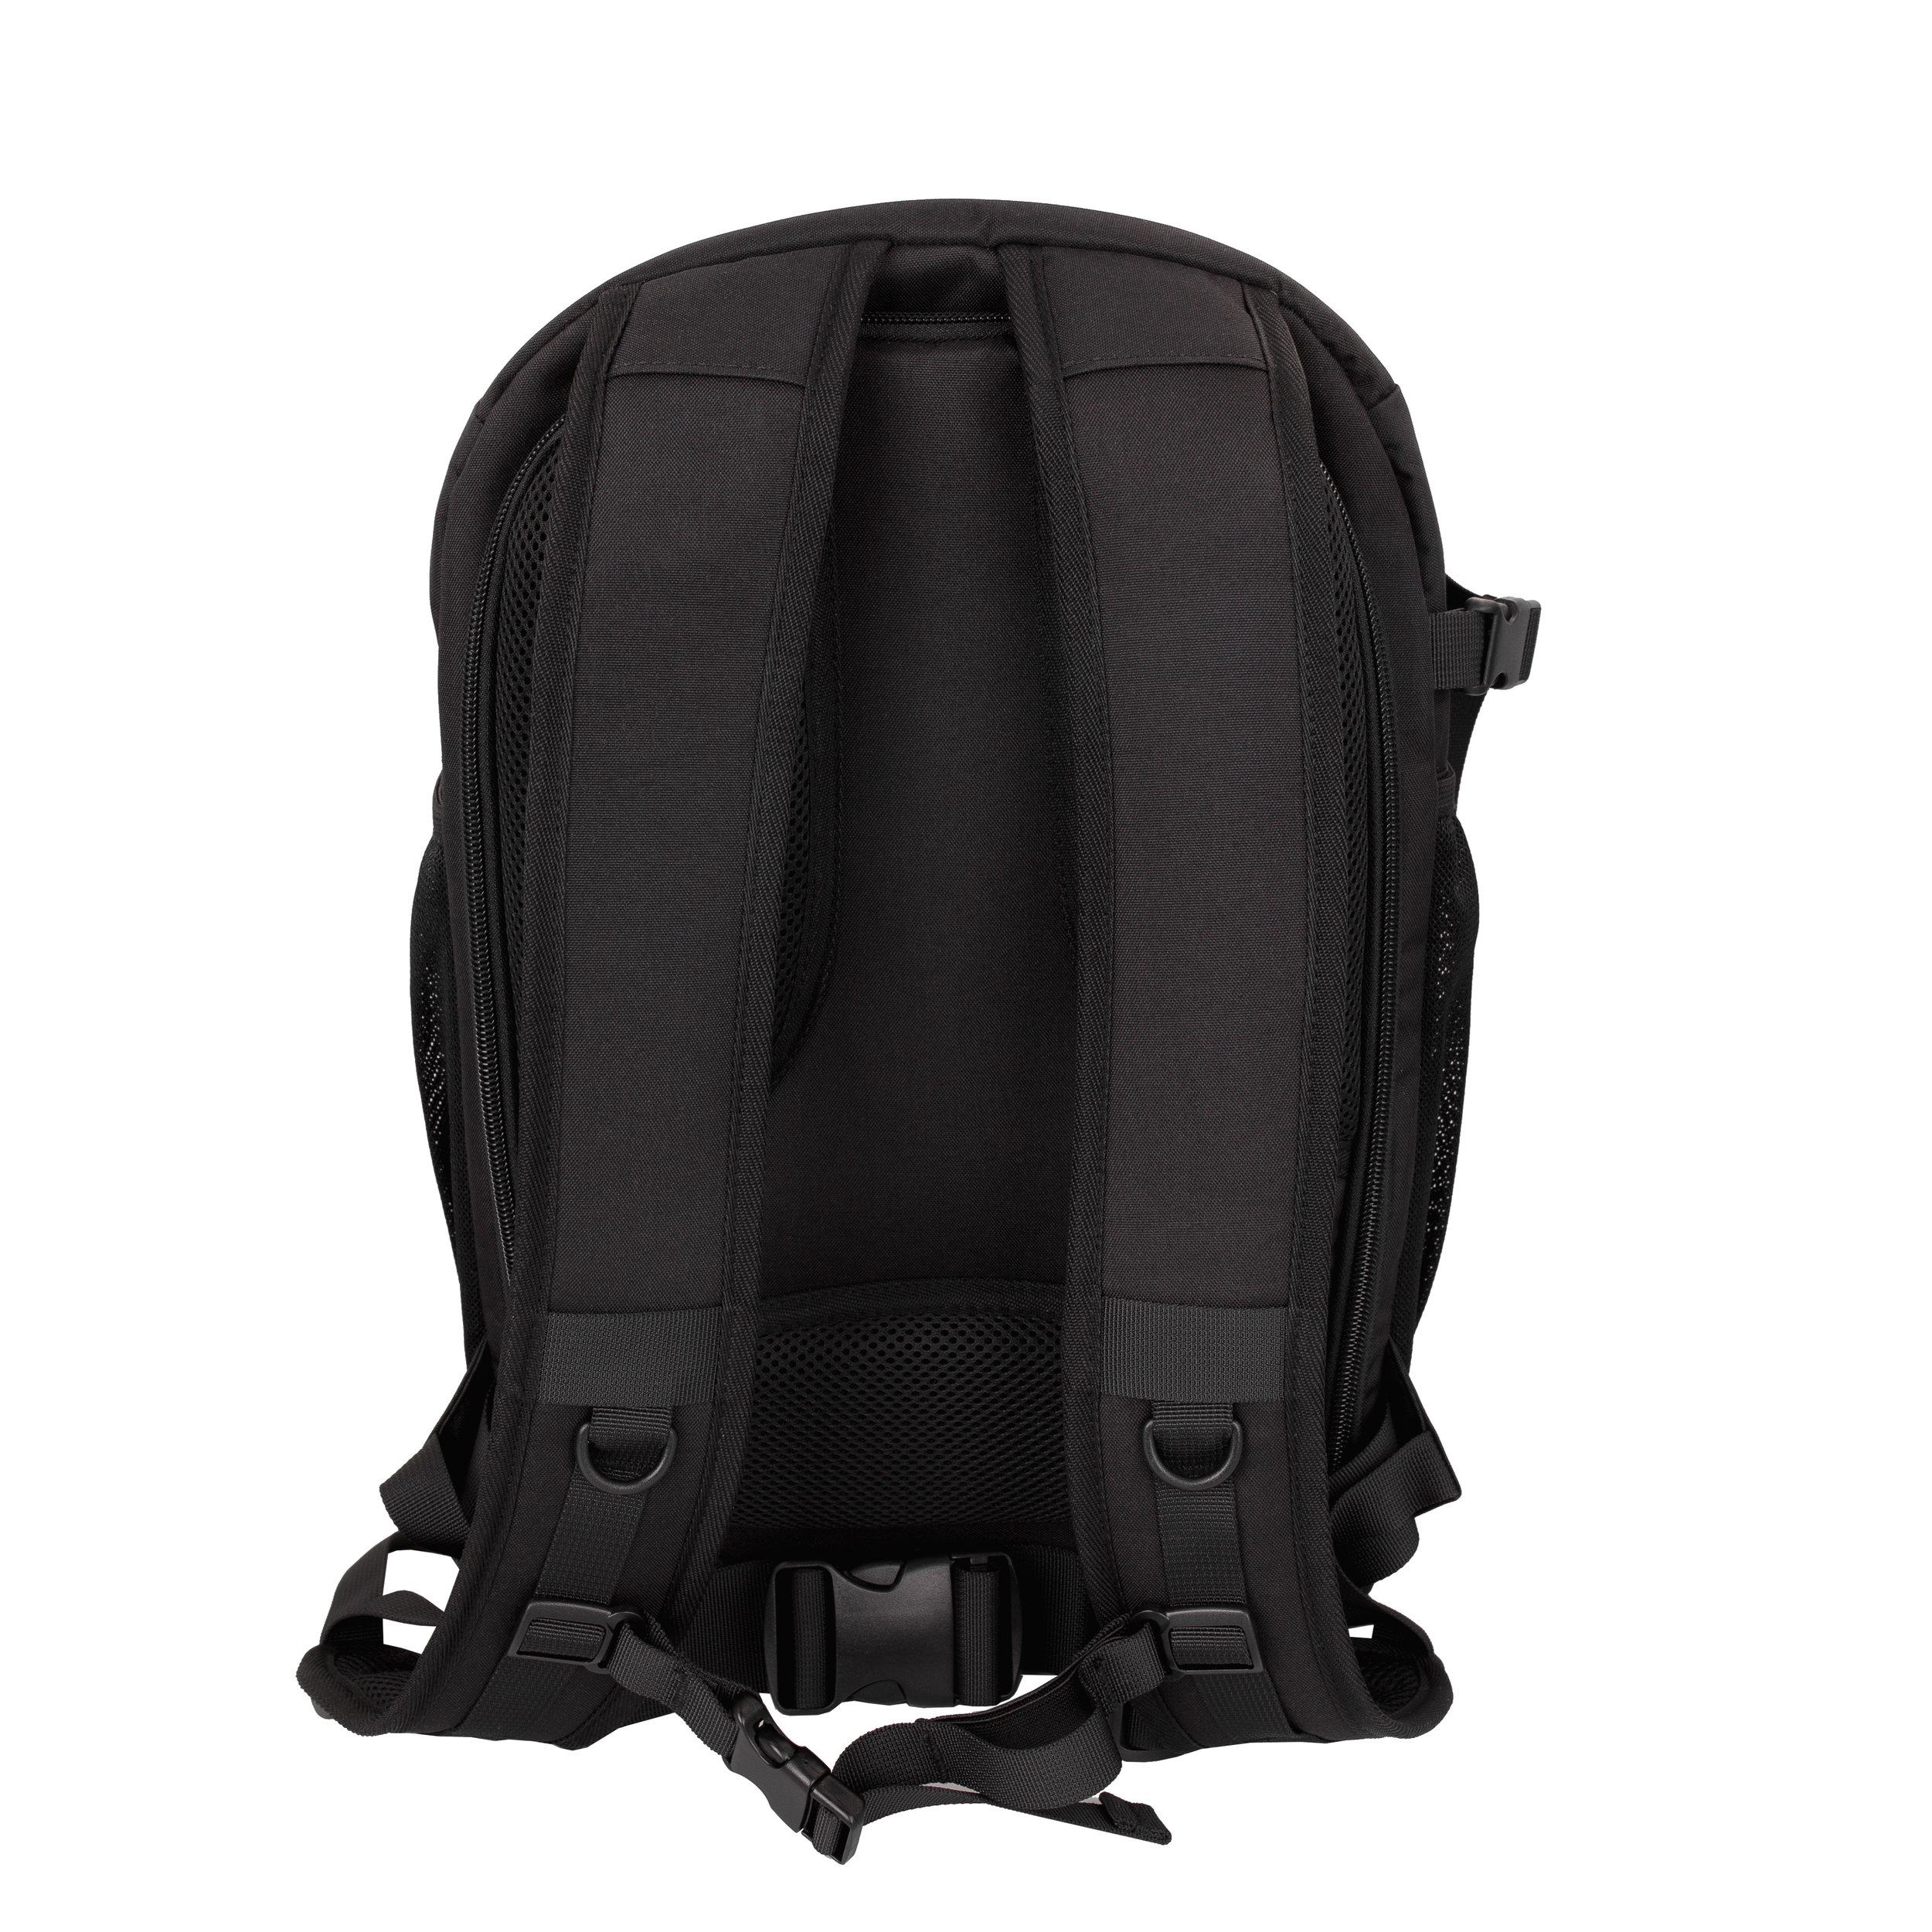 Promaster Impulse Backpack Black Large Richmond Camera